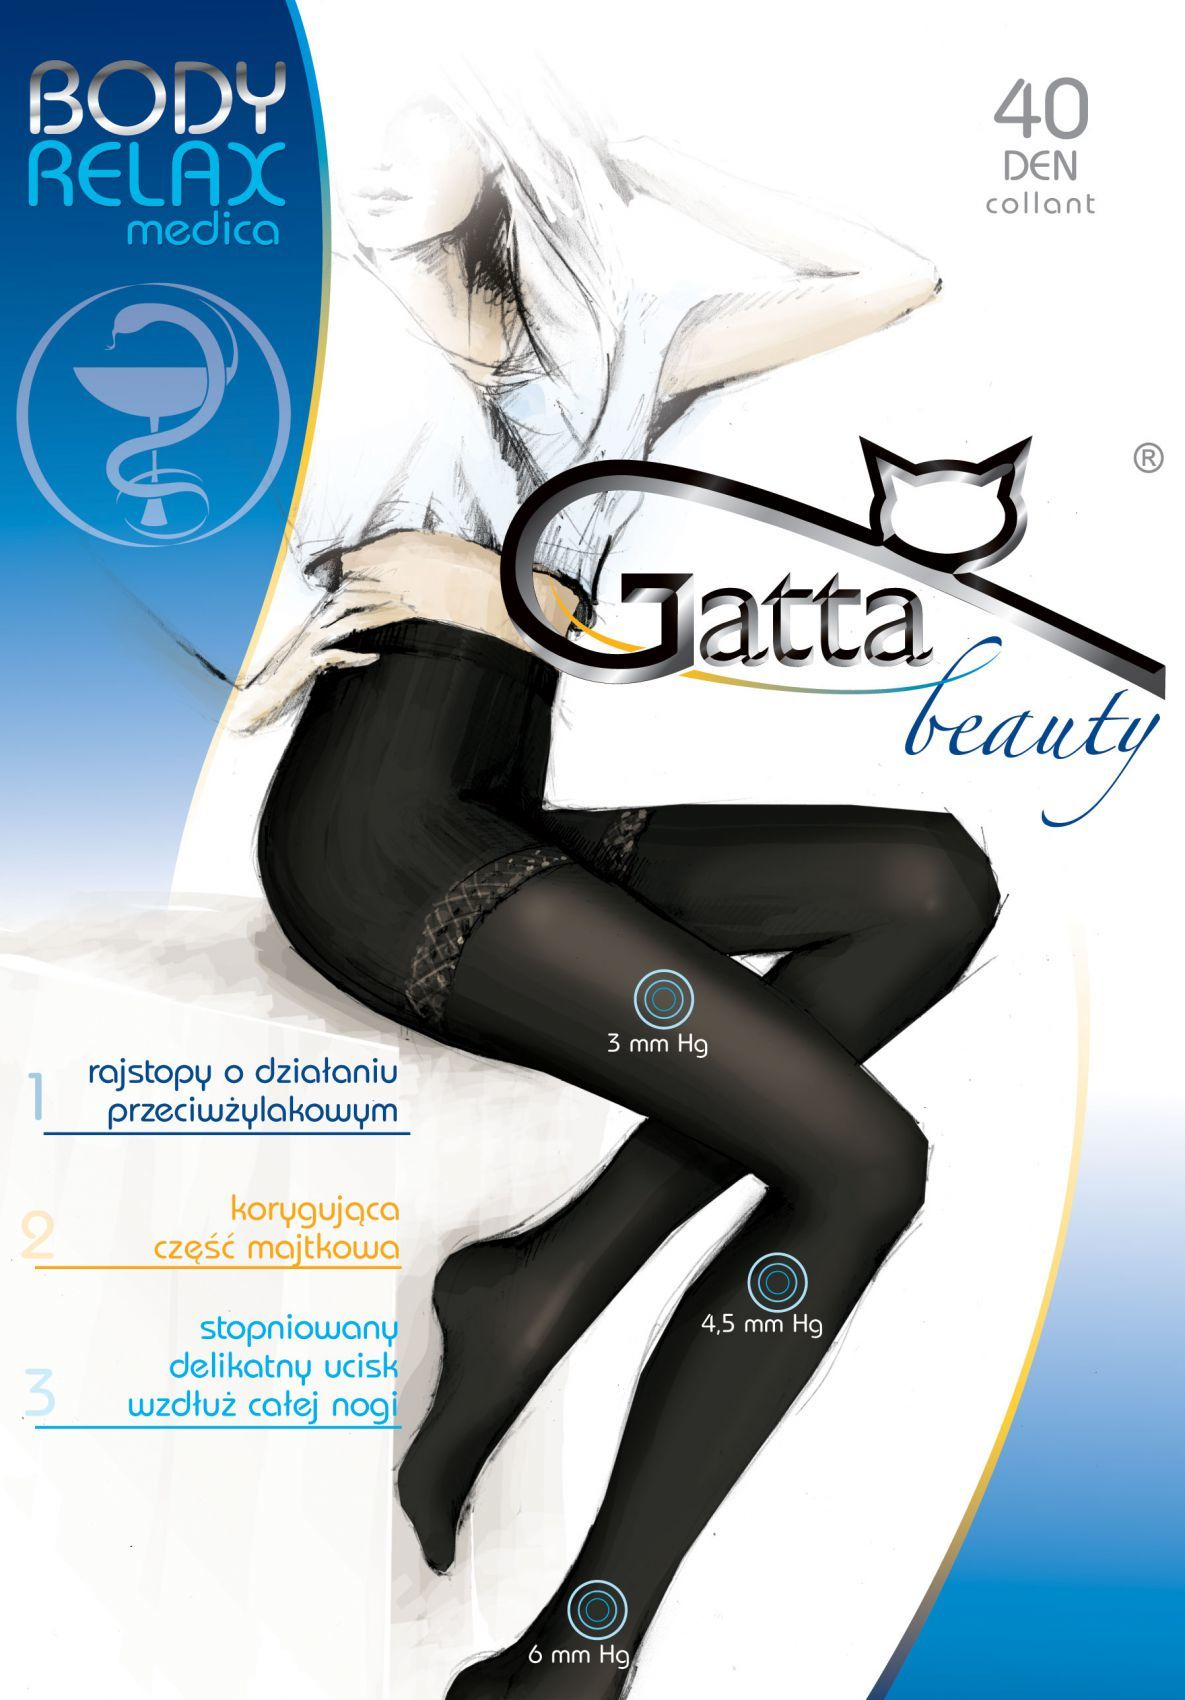 RAJSTOPY GATTA B RELAXMEDICA 40